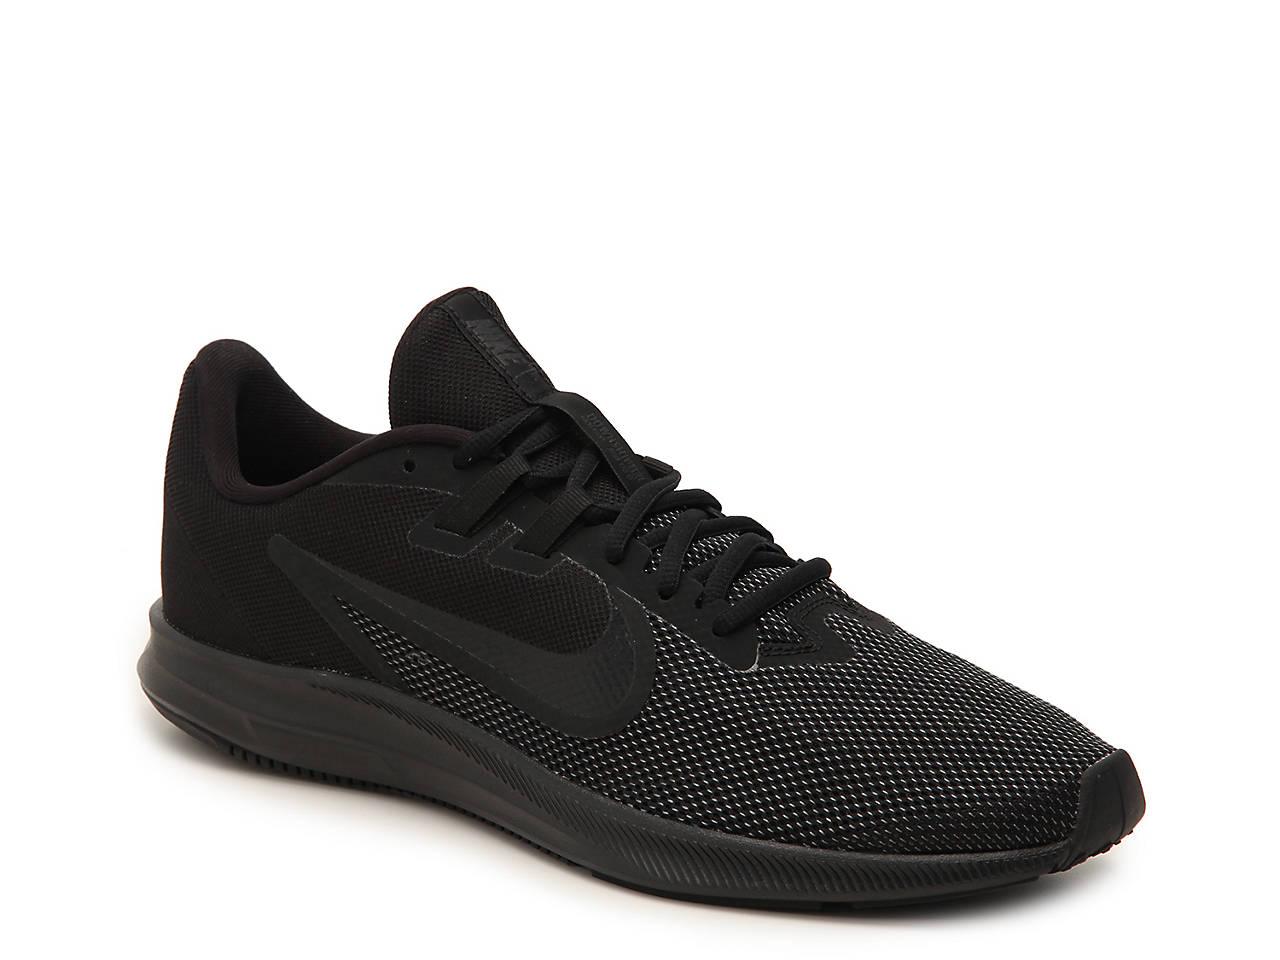 save off 7152b 992c5 Nike. Downshifter 9 Lightweight Running Shoe - Men s